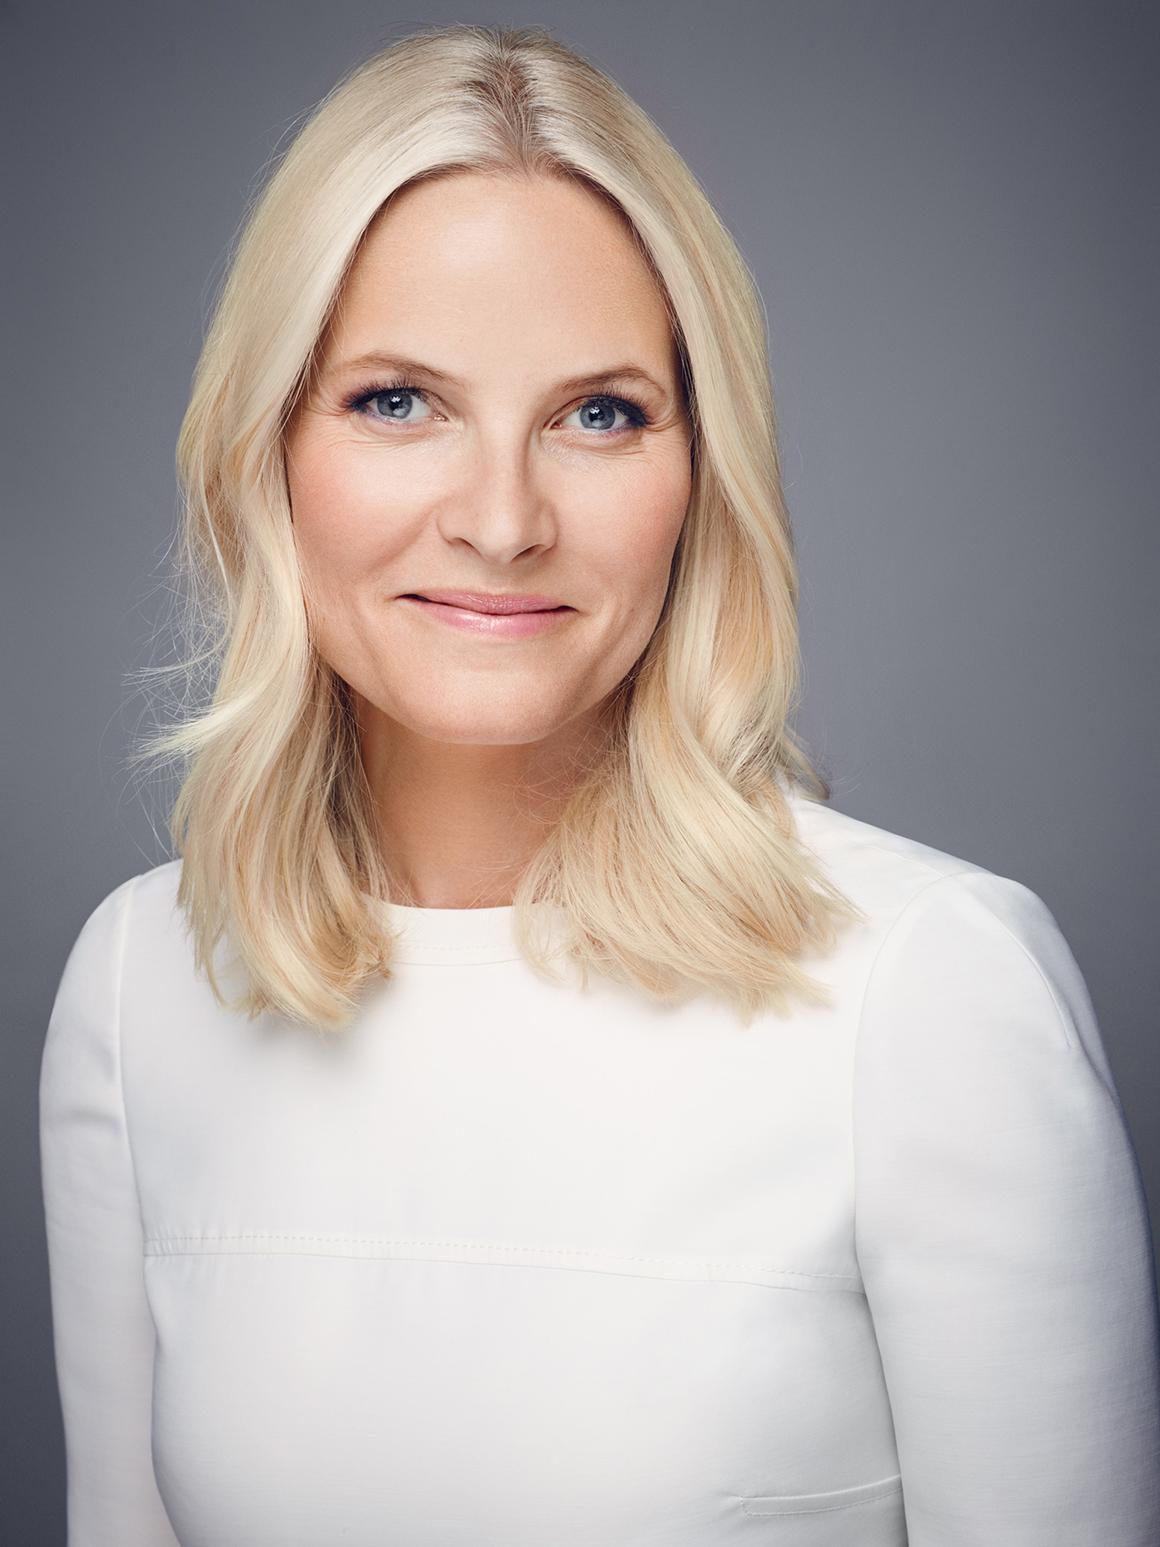 Norway Crown Princess Mette Marit The Royal House Of Norway